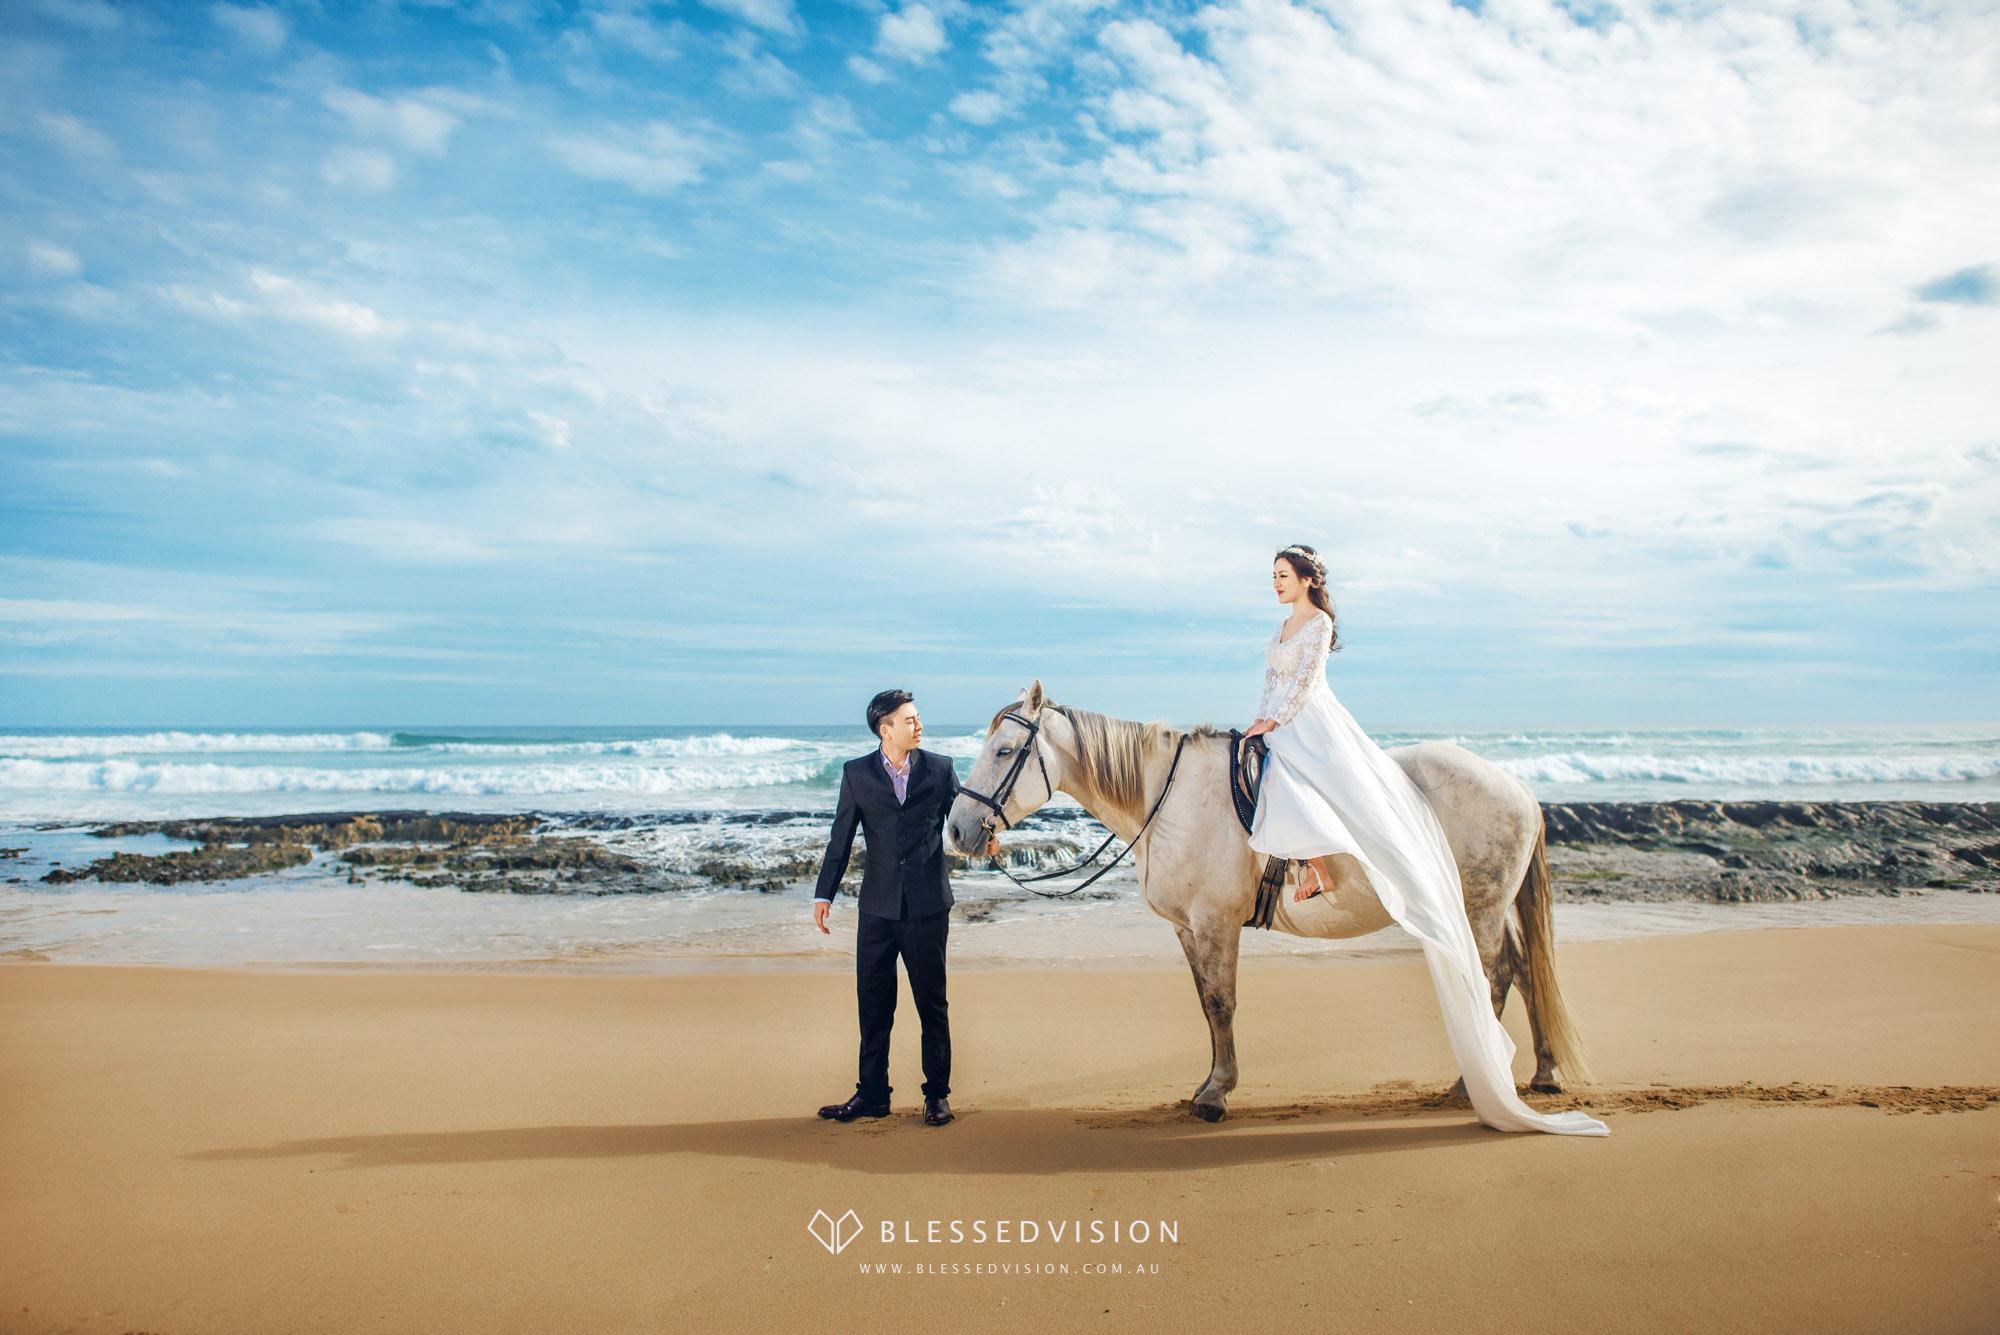 mornington horse riding Gunnamatta Trail Rides Pre wedding Blessed Vision Melbourne Prewedding Photography 墨尔本 婚纱摄影 婚纱照 婚礼跟拍-1-2